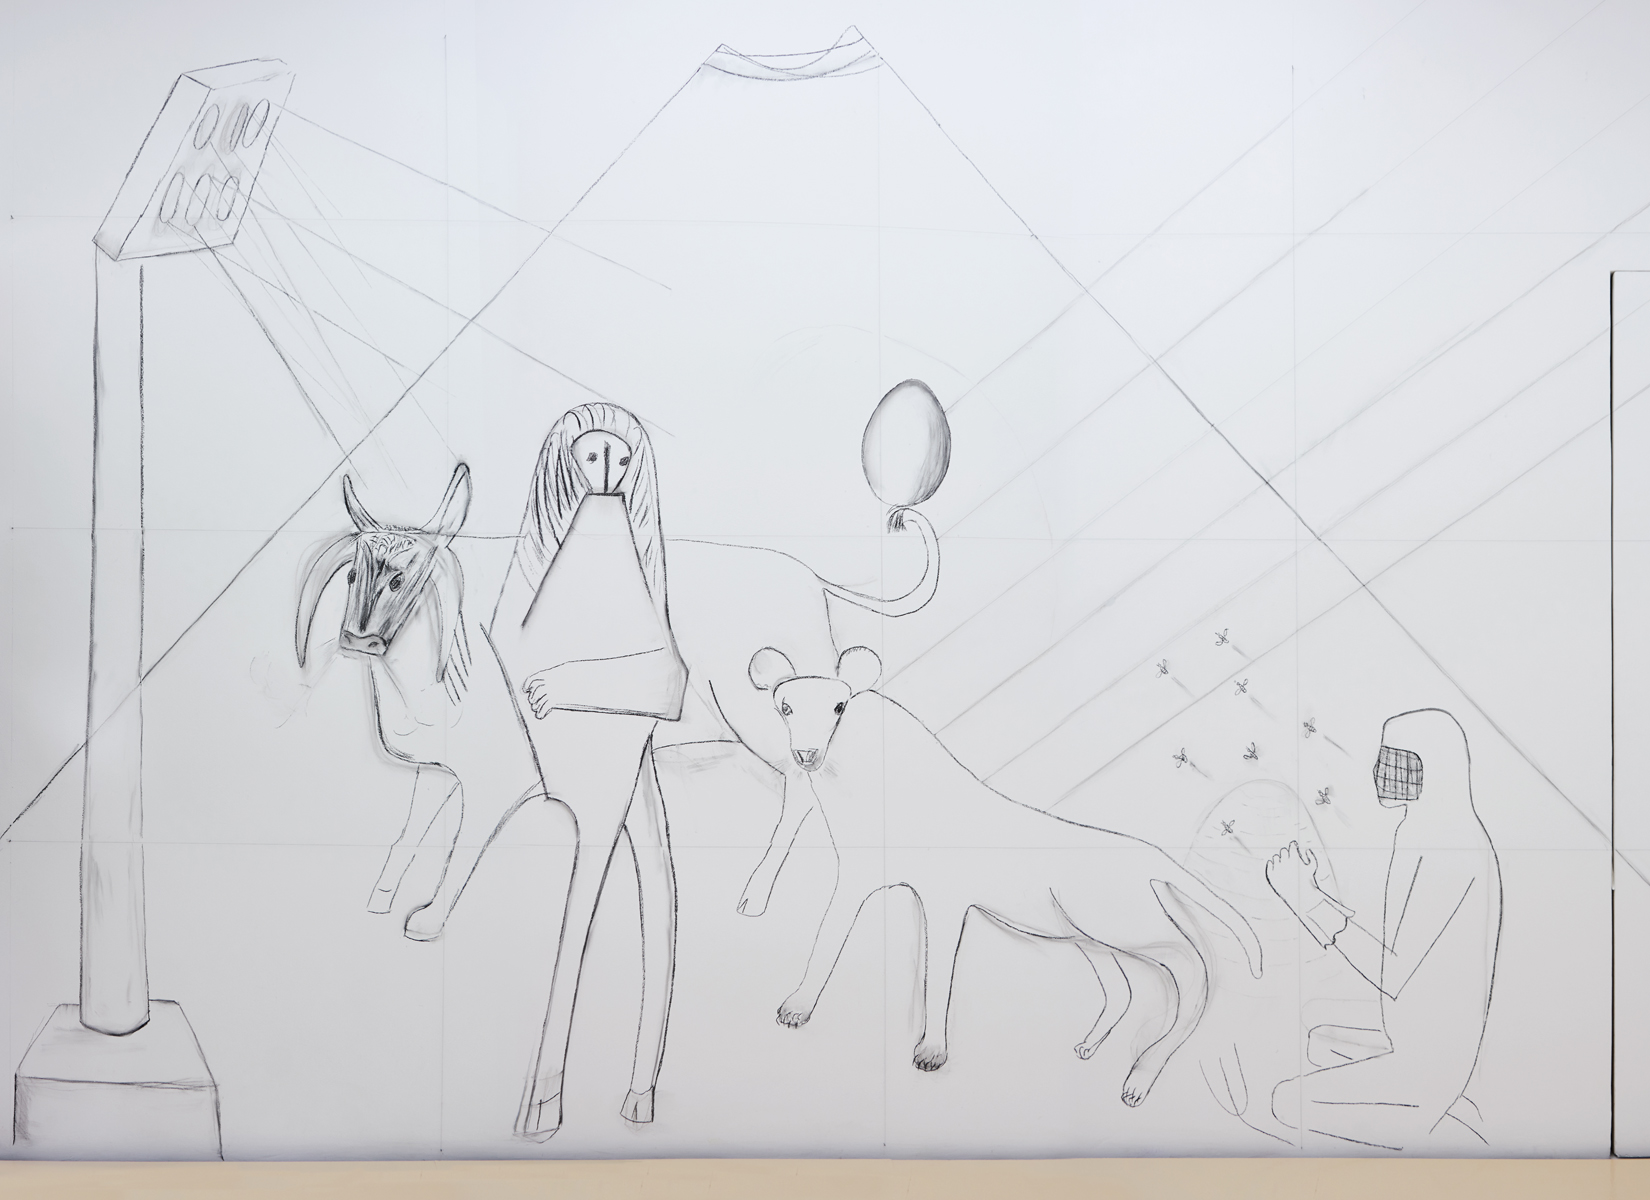 Lin May Saeed, Mural, 2017. charcoal drawing in situ, Dimensions variable